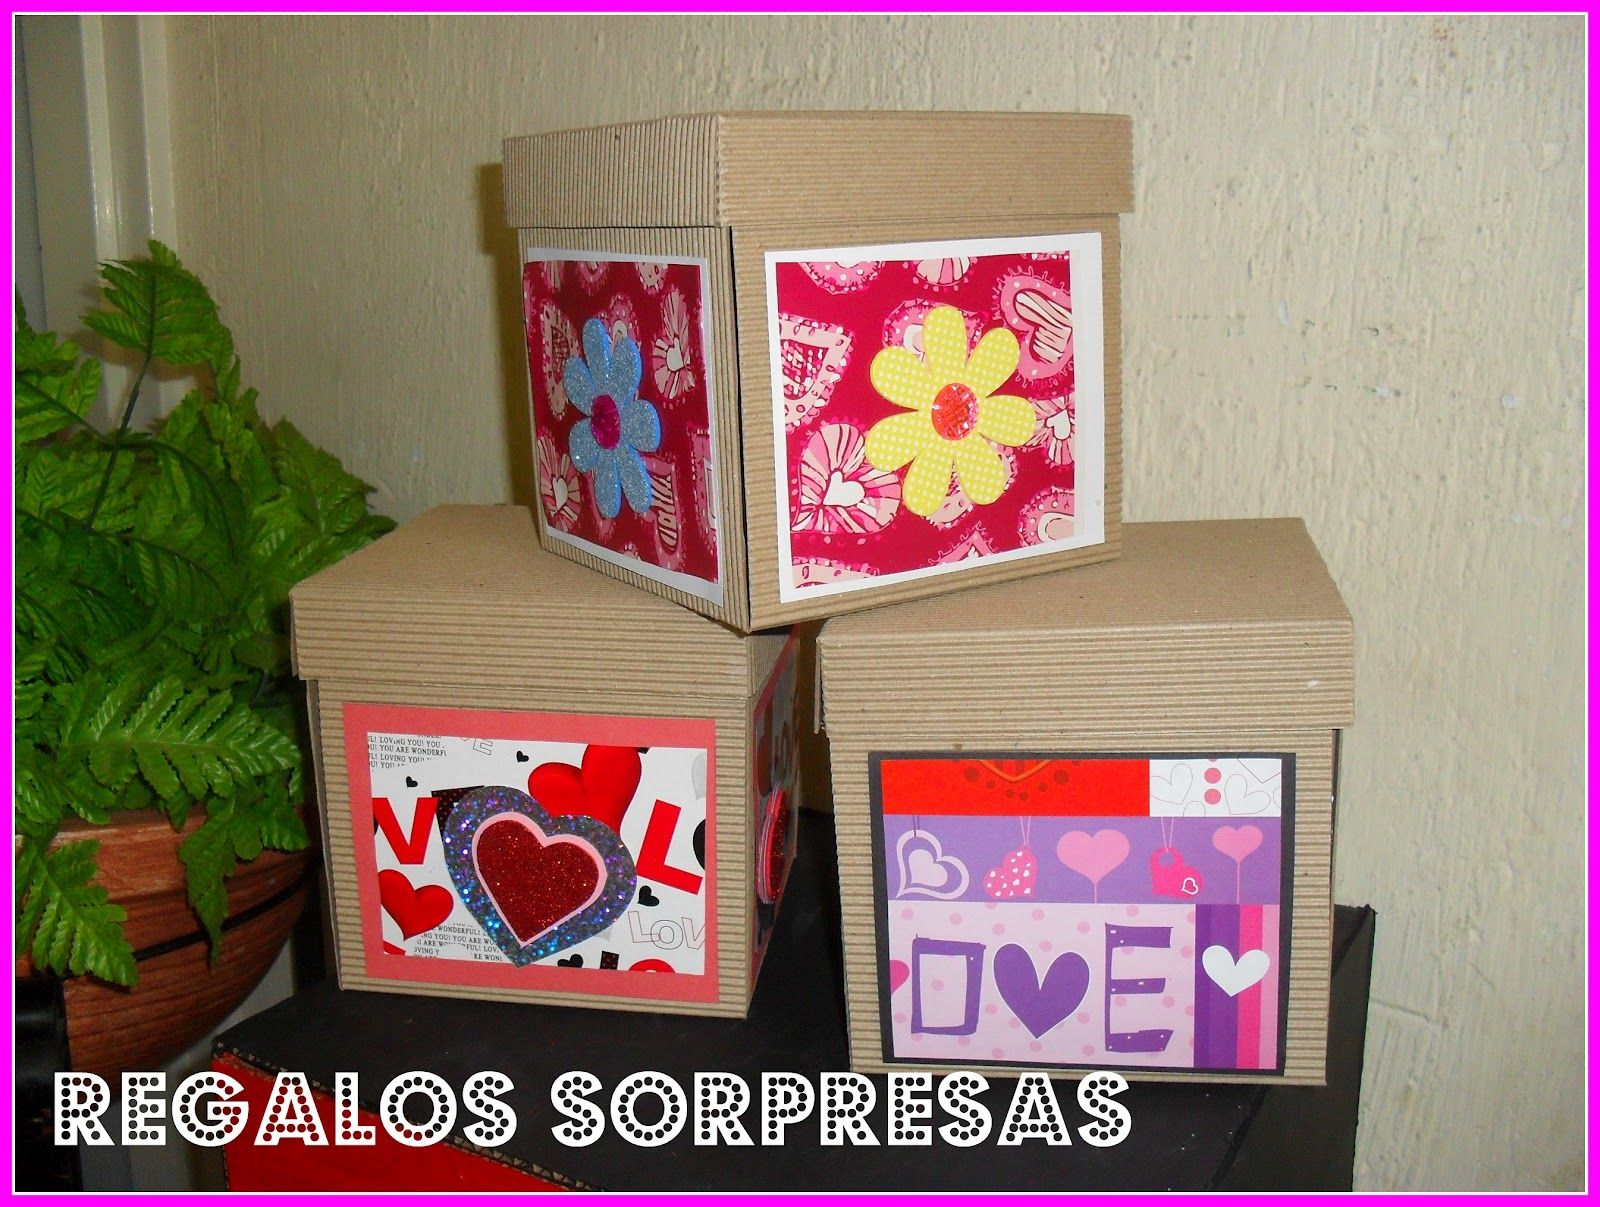 Pin By Eduardo Lopez On Cajas Decoradas Regalos Decorative Boxes Rubiks Cube Decor